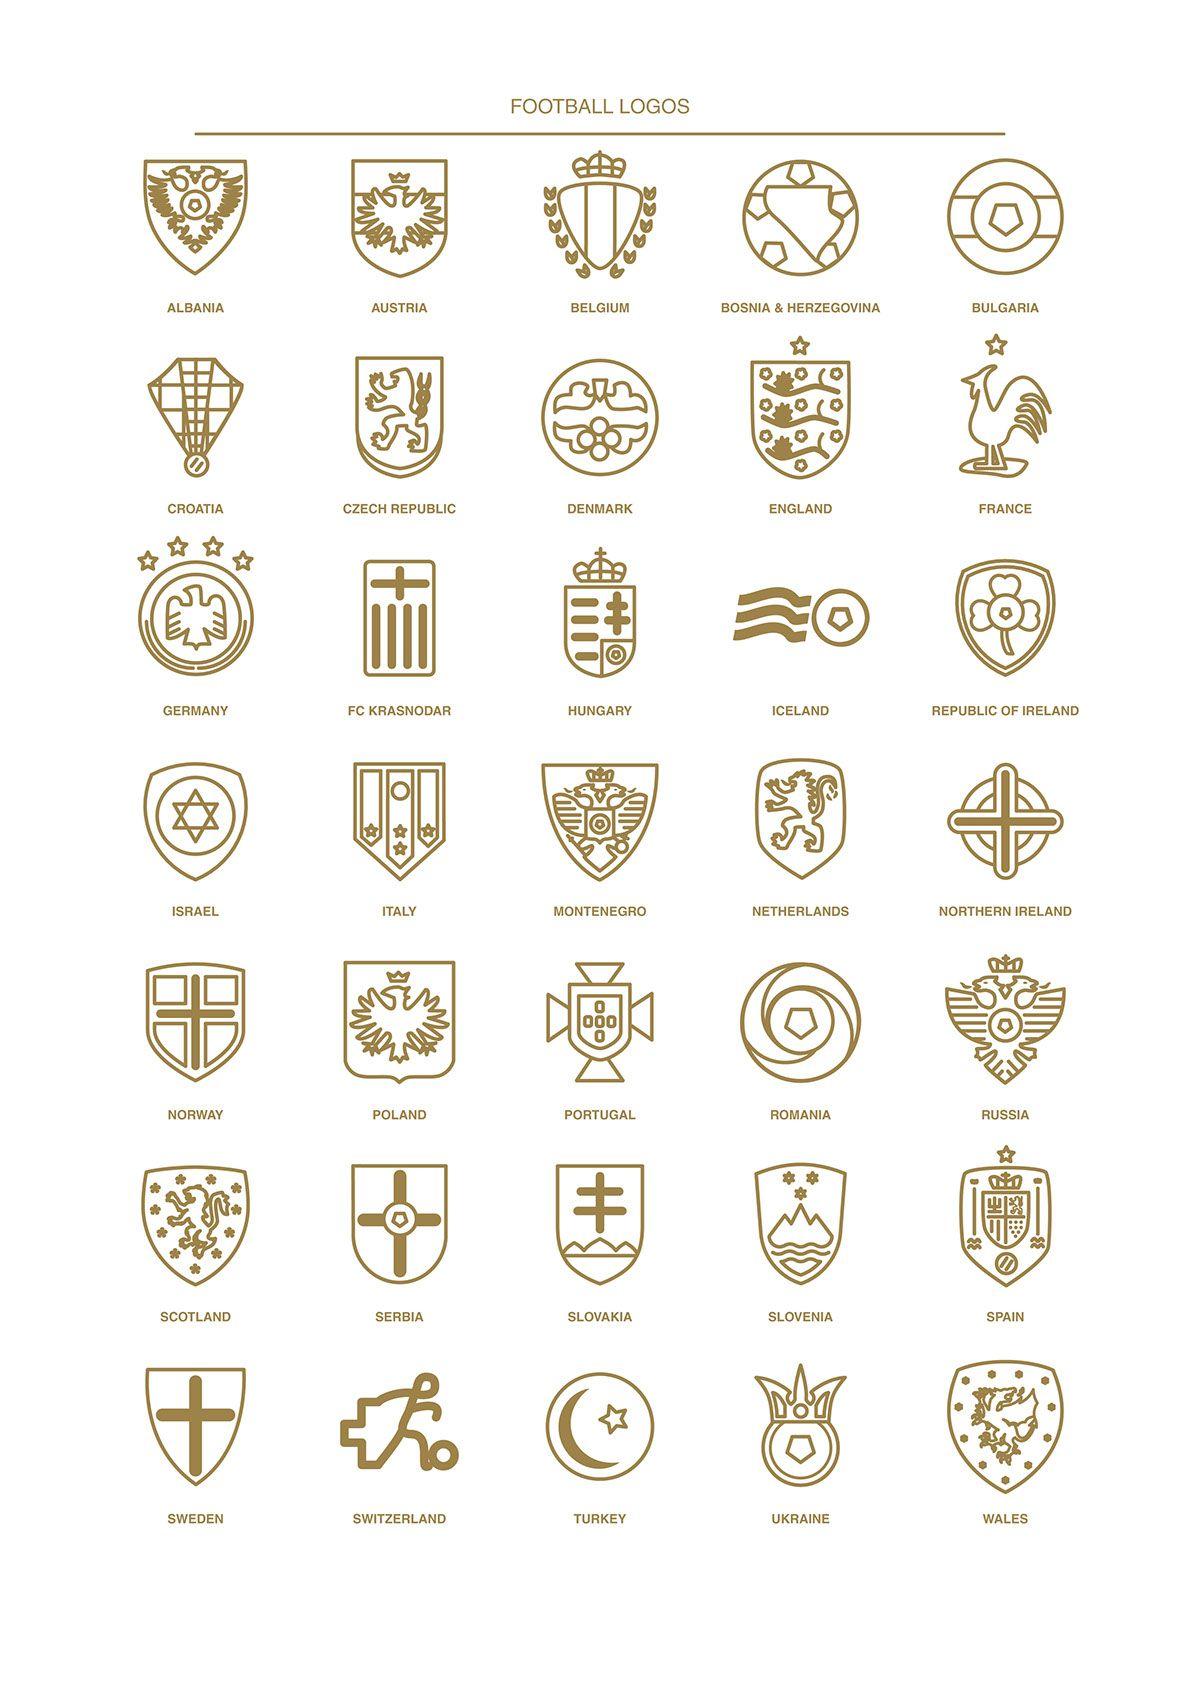 Football Logos 2016 on Behance | Minimal Football Logos ...